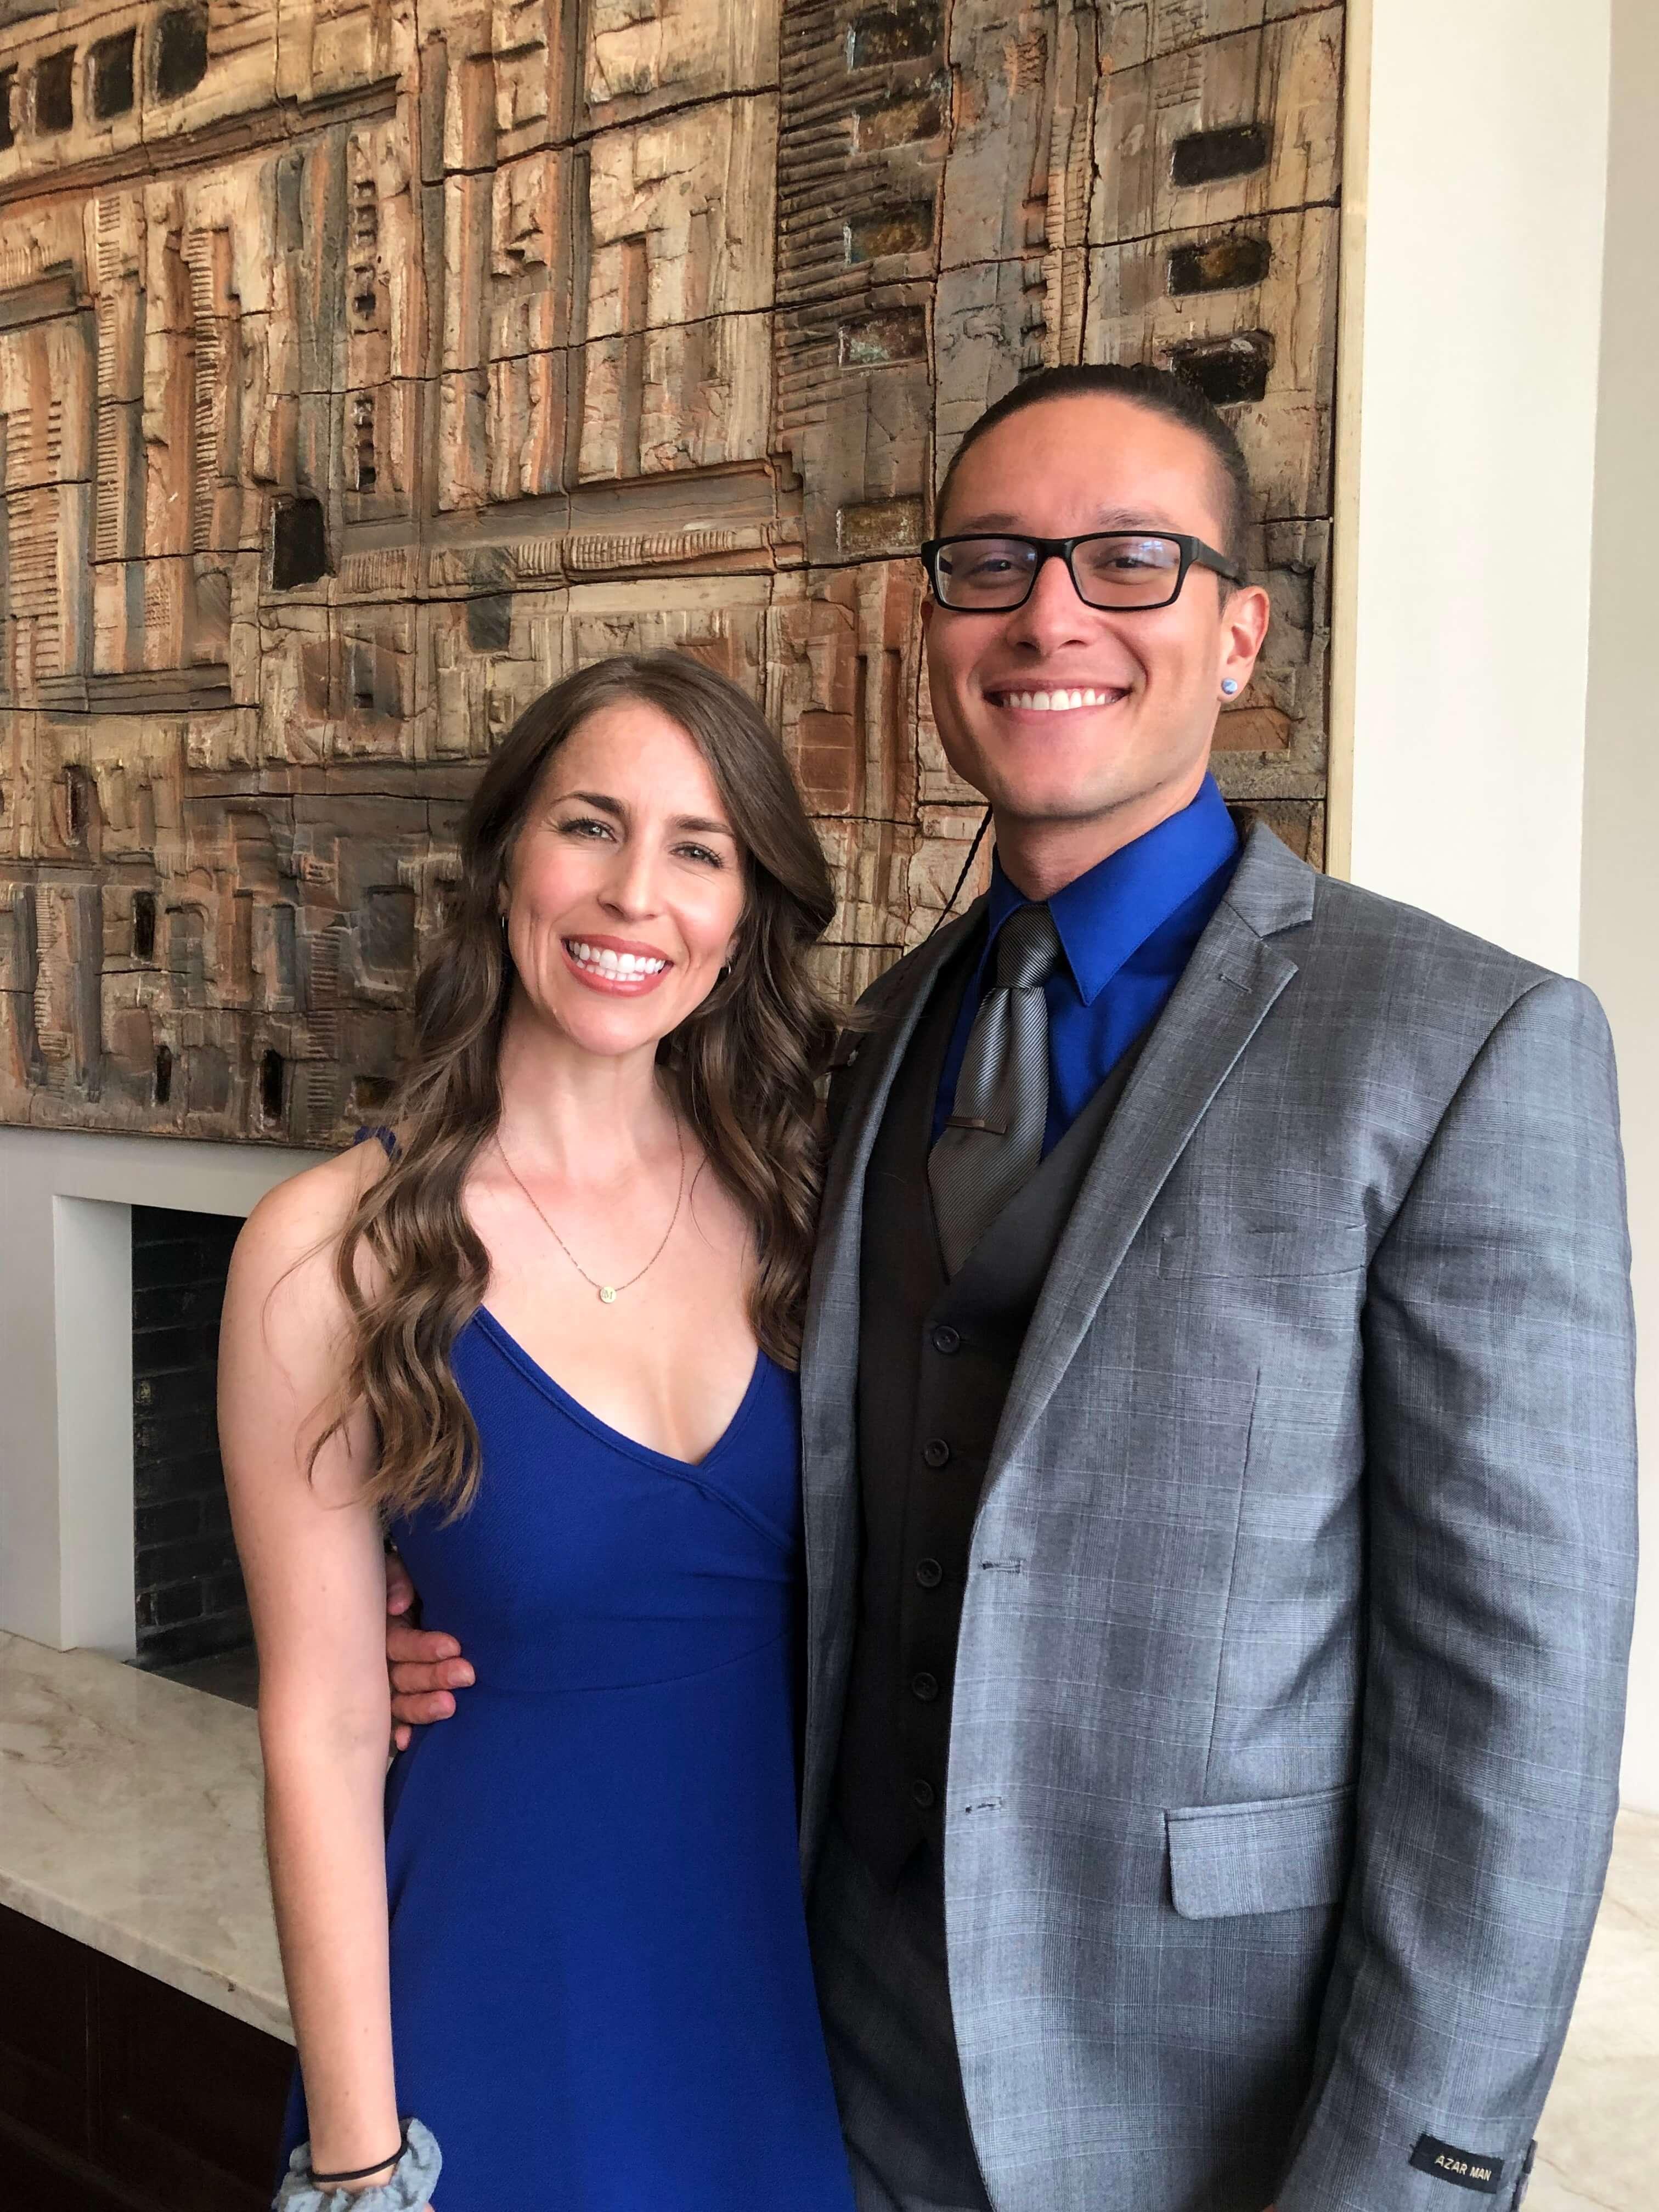 rachael and mark beneke at gerald's wedding